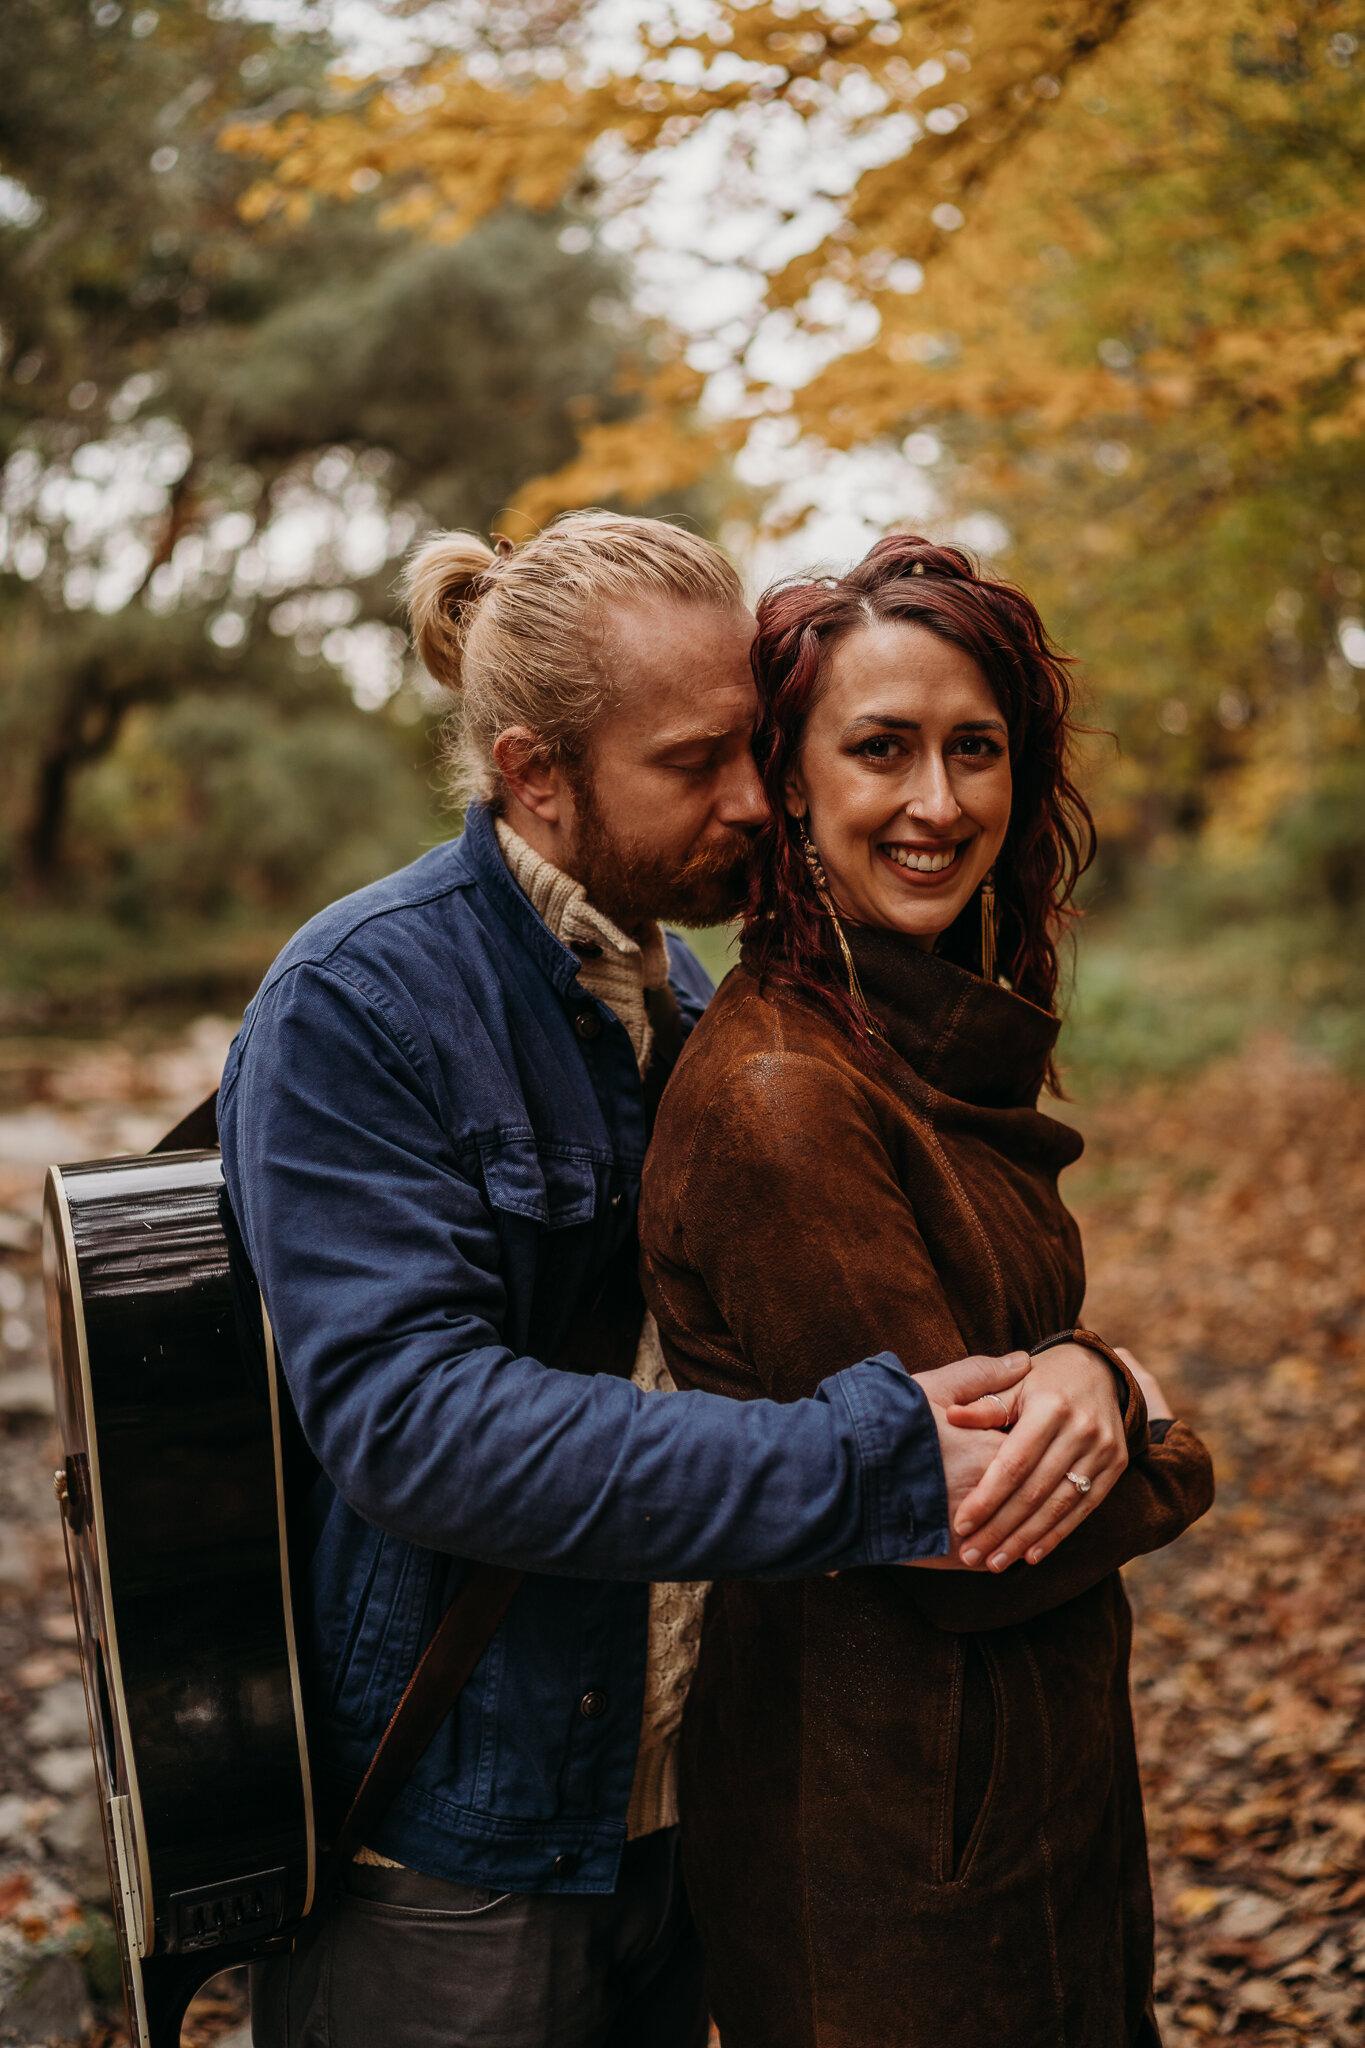 Susan And Kirk Engagement Robert Treman park-07002.jpg